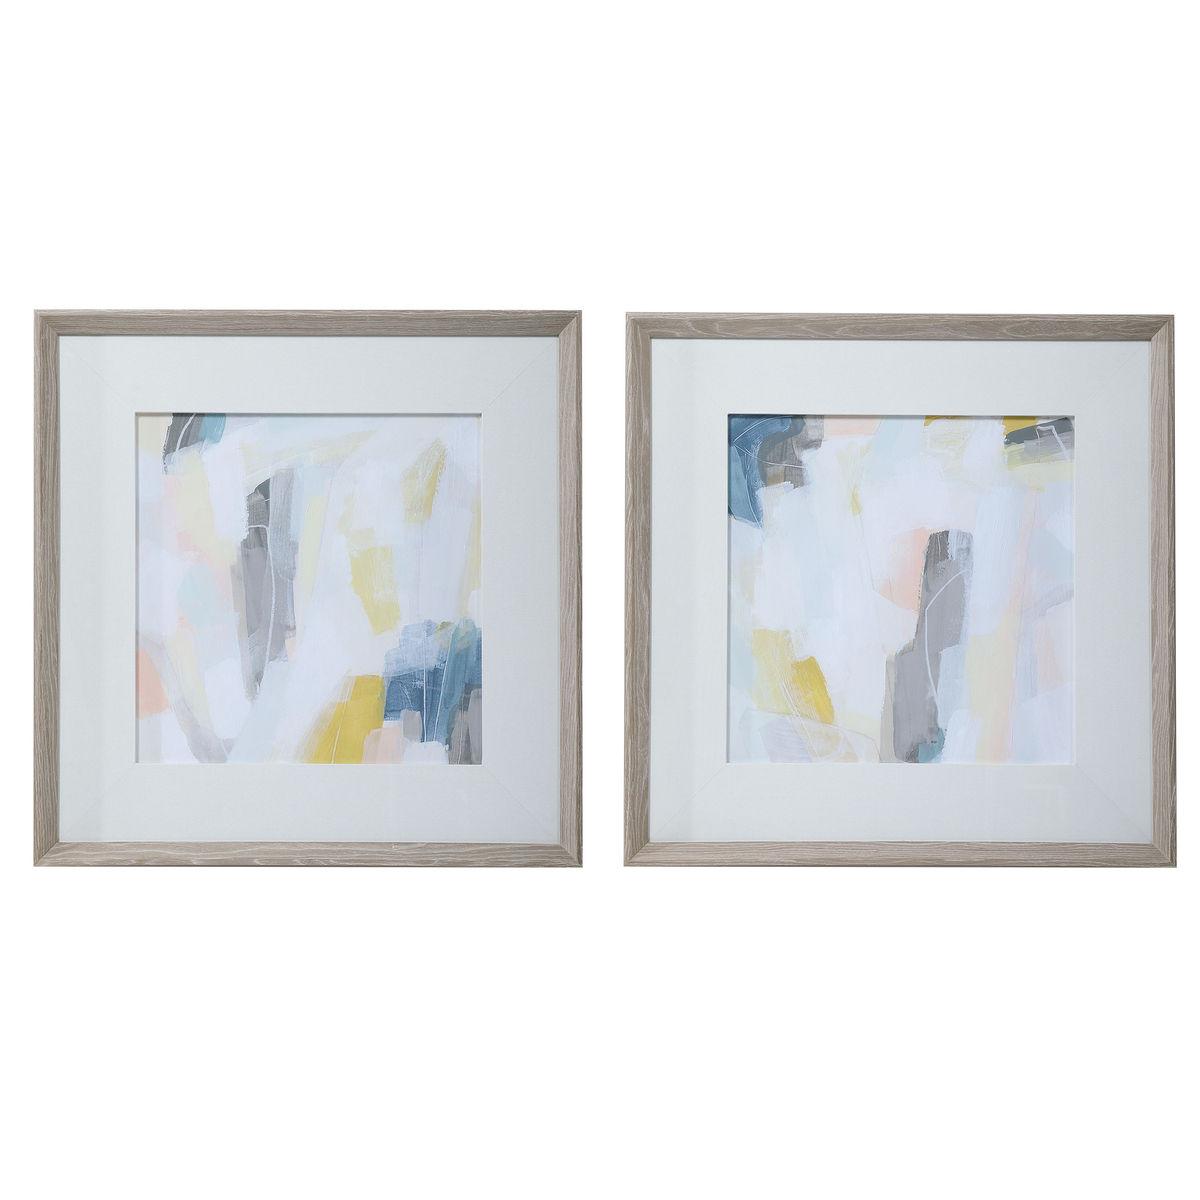 Uttermost Fractal Pastel Abstract Art, S/2